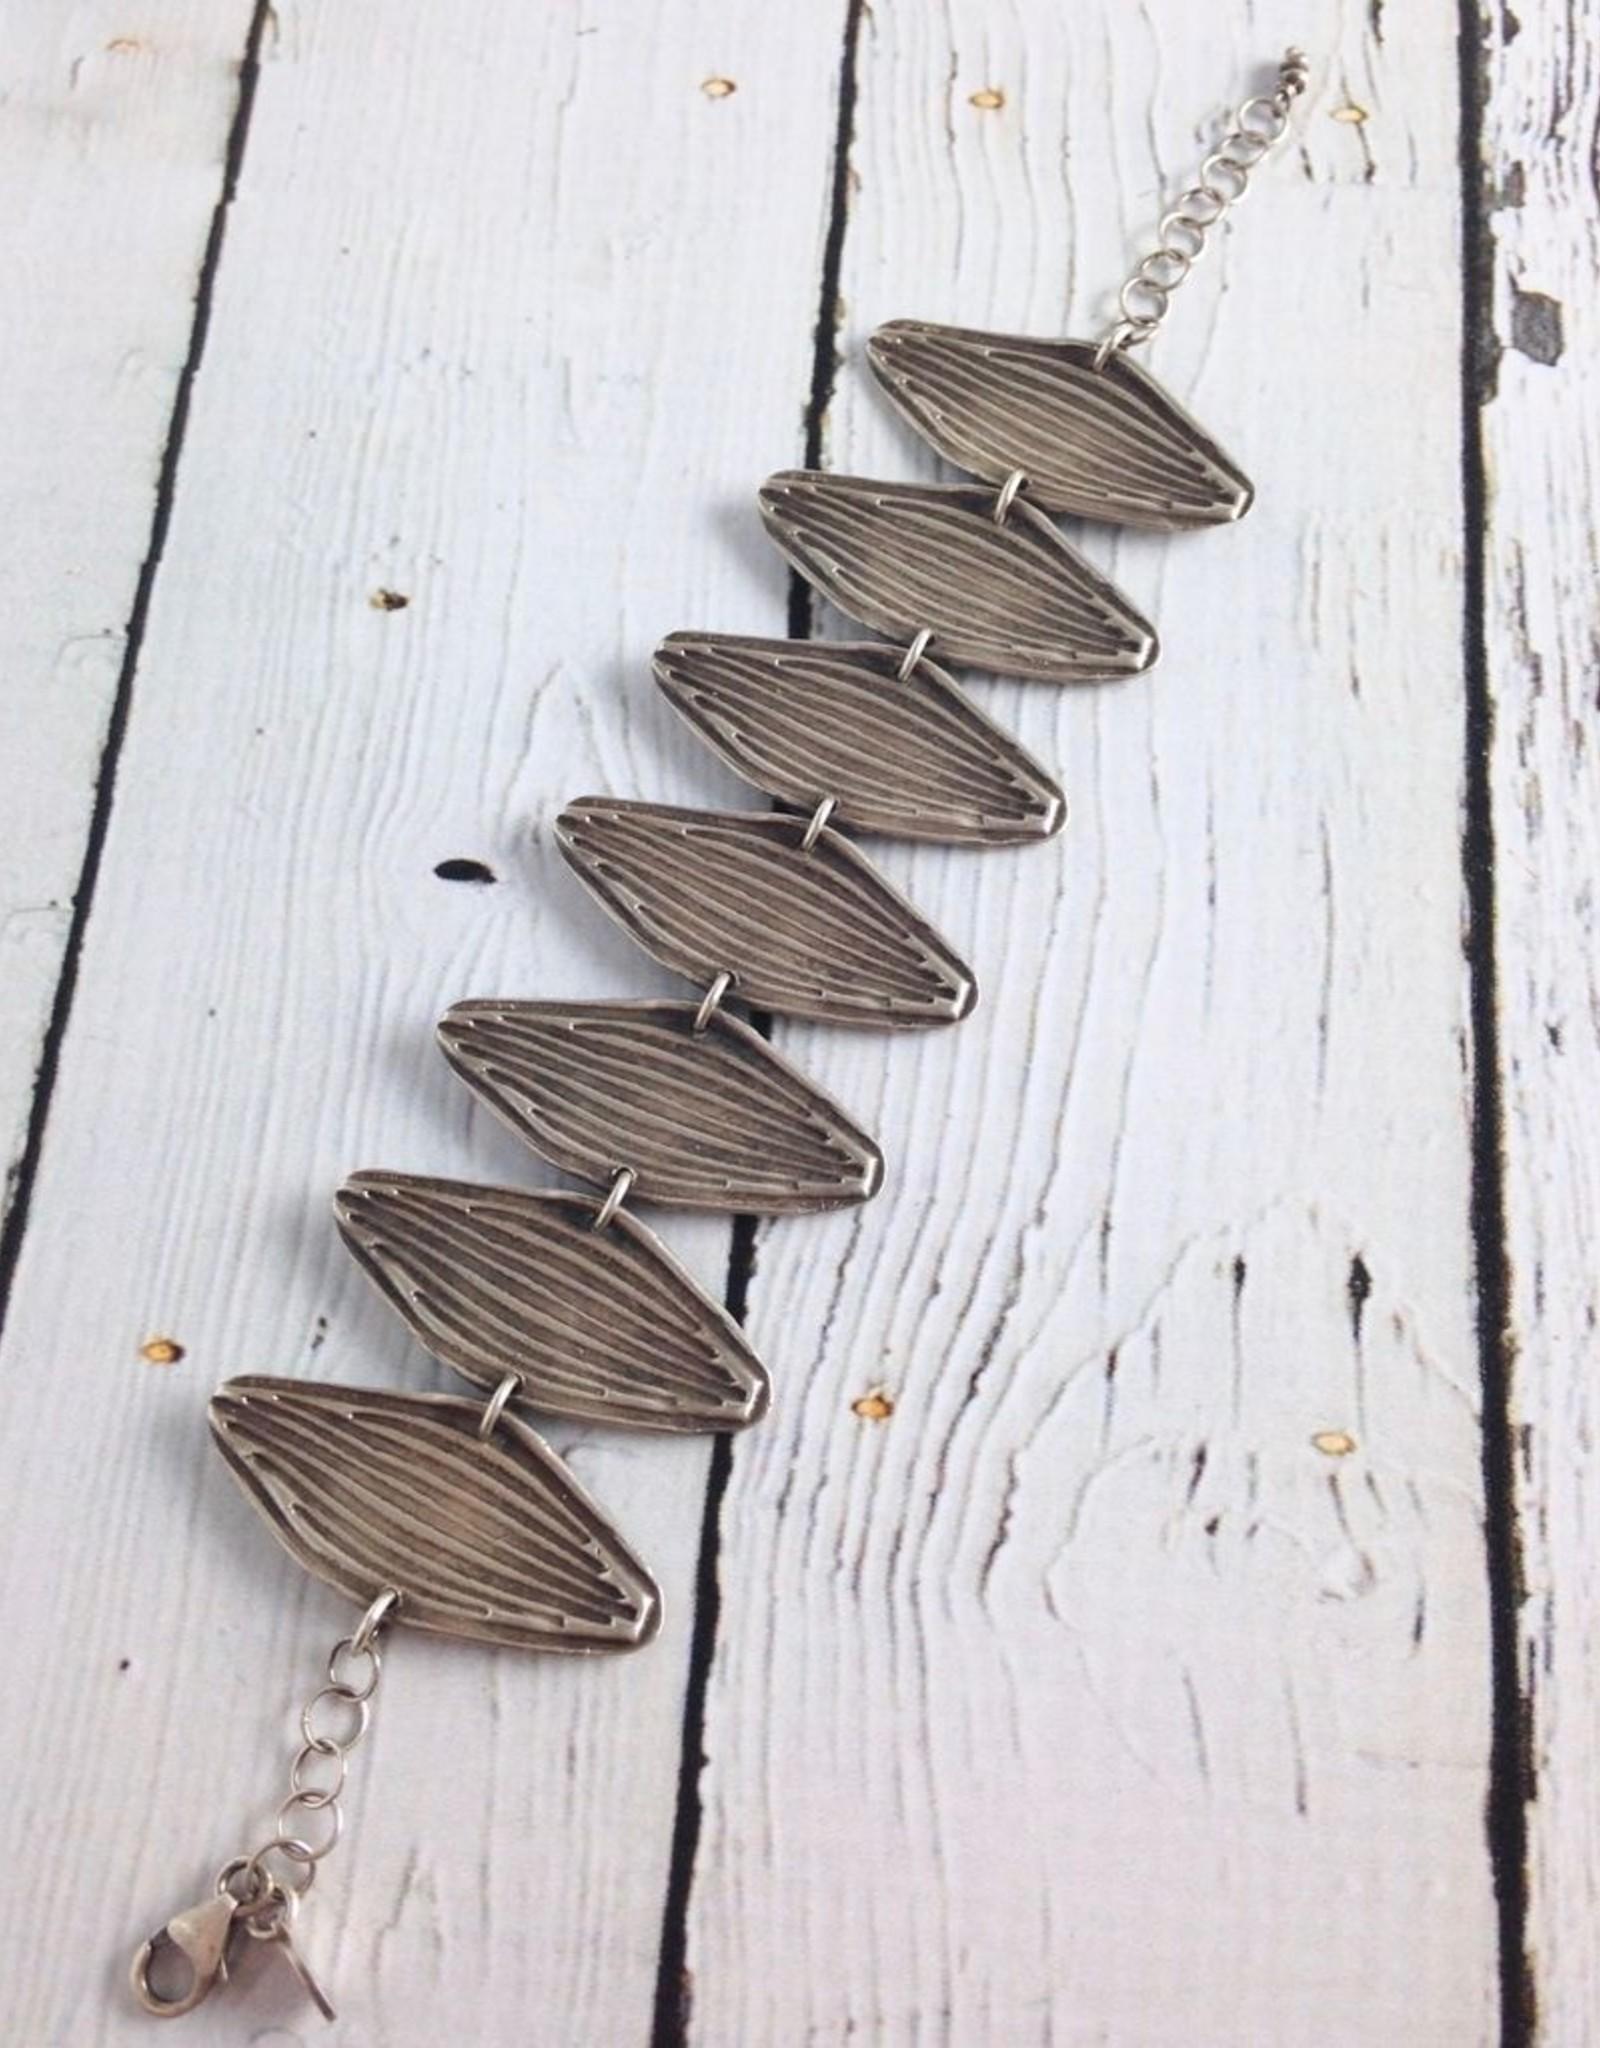 Handmade Oxidized Sterling Silver Wide Cast Leaf Cuff Bracelet by J&I